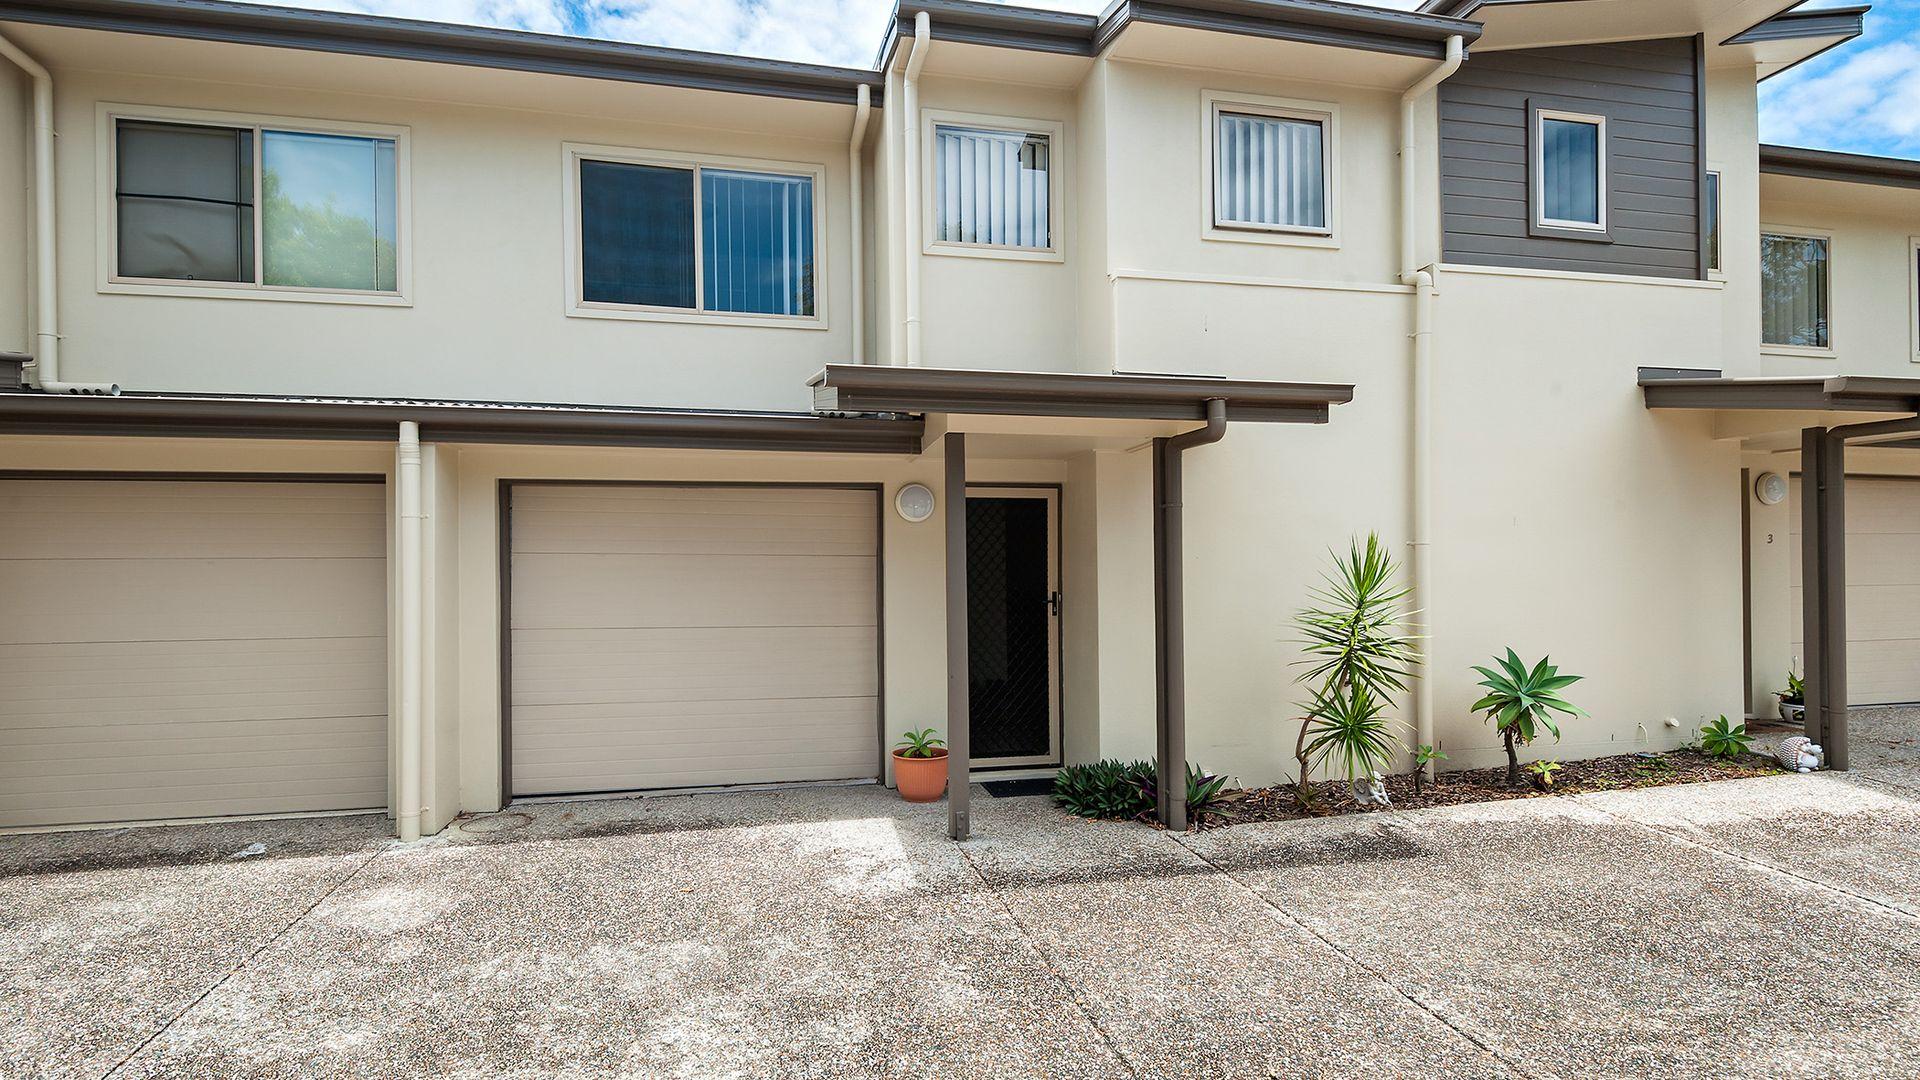 2/13 Osterley Avenue, Caloundra QLD 4551, Image 1